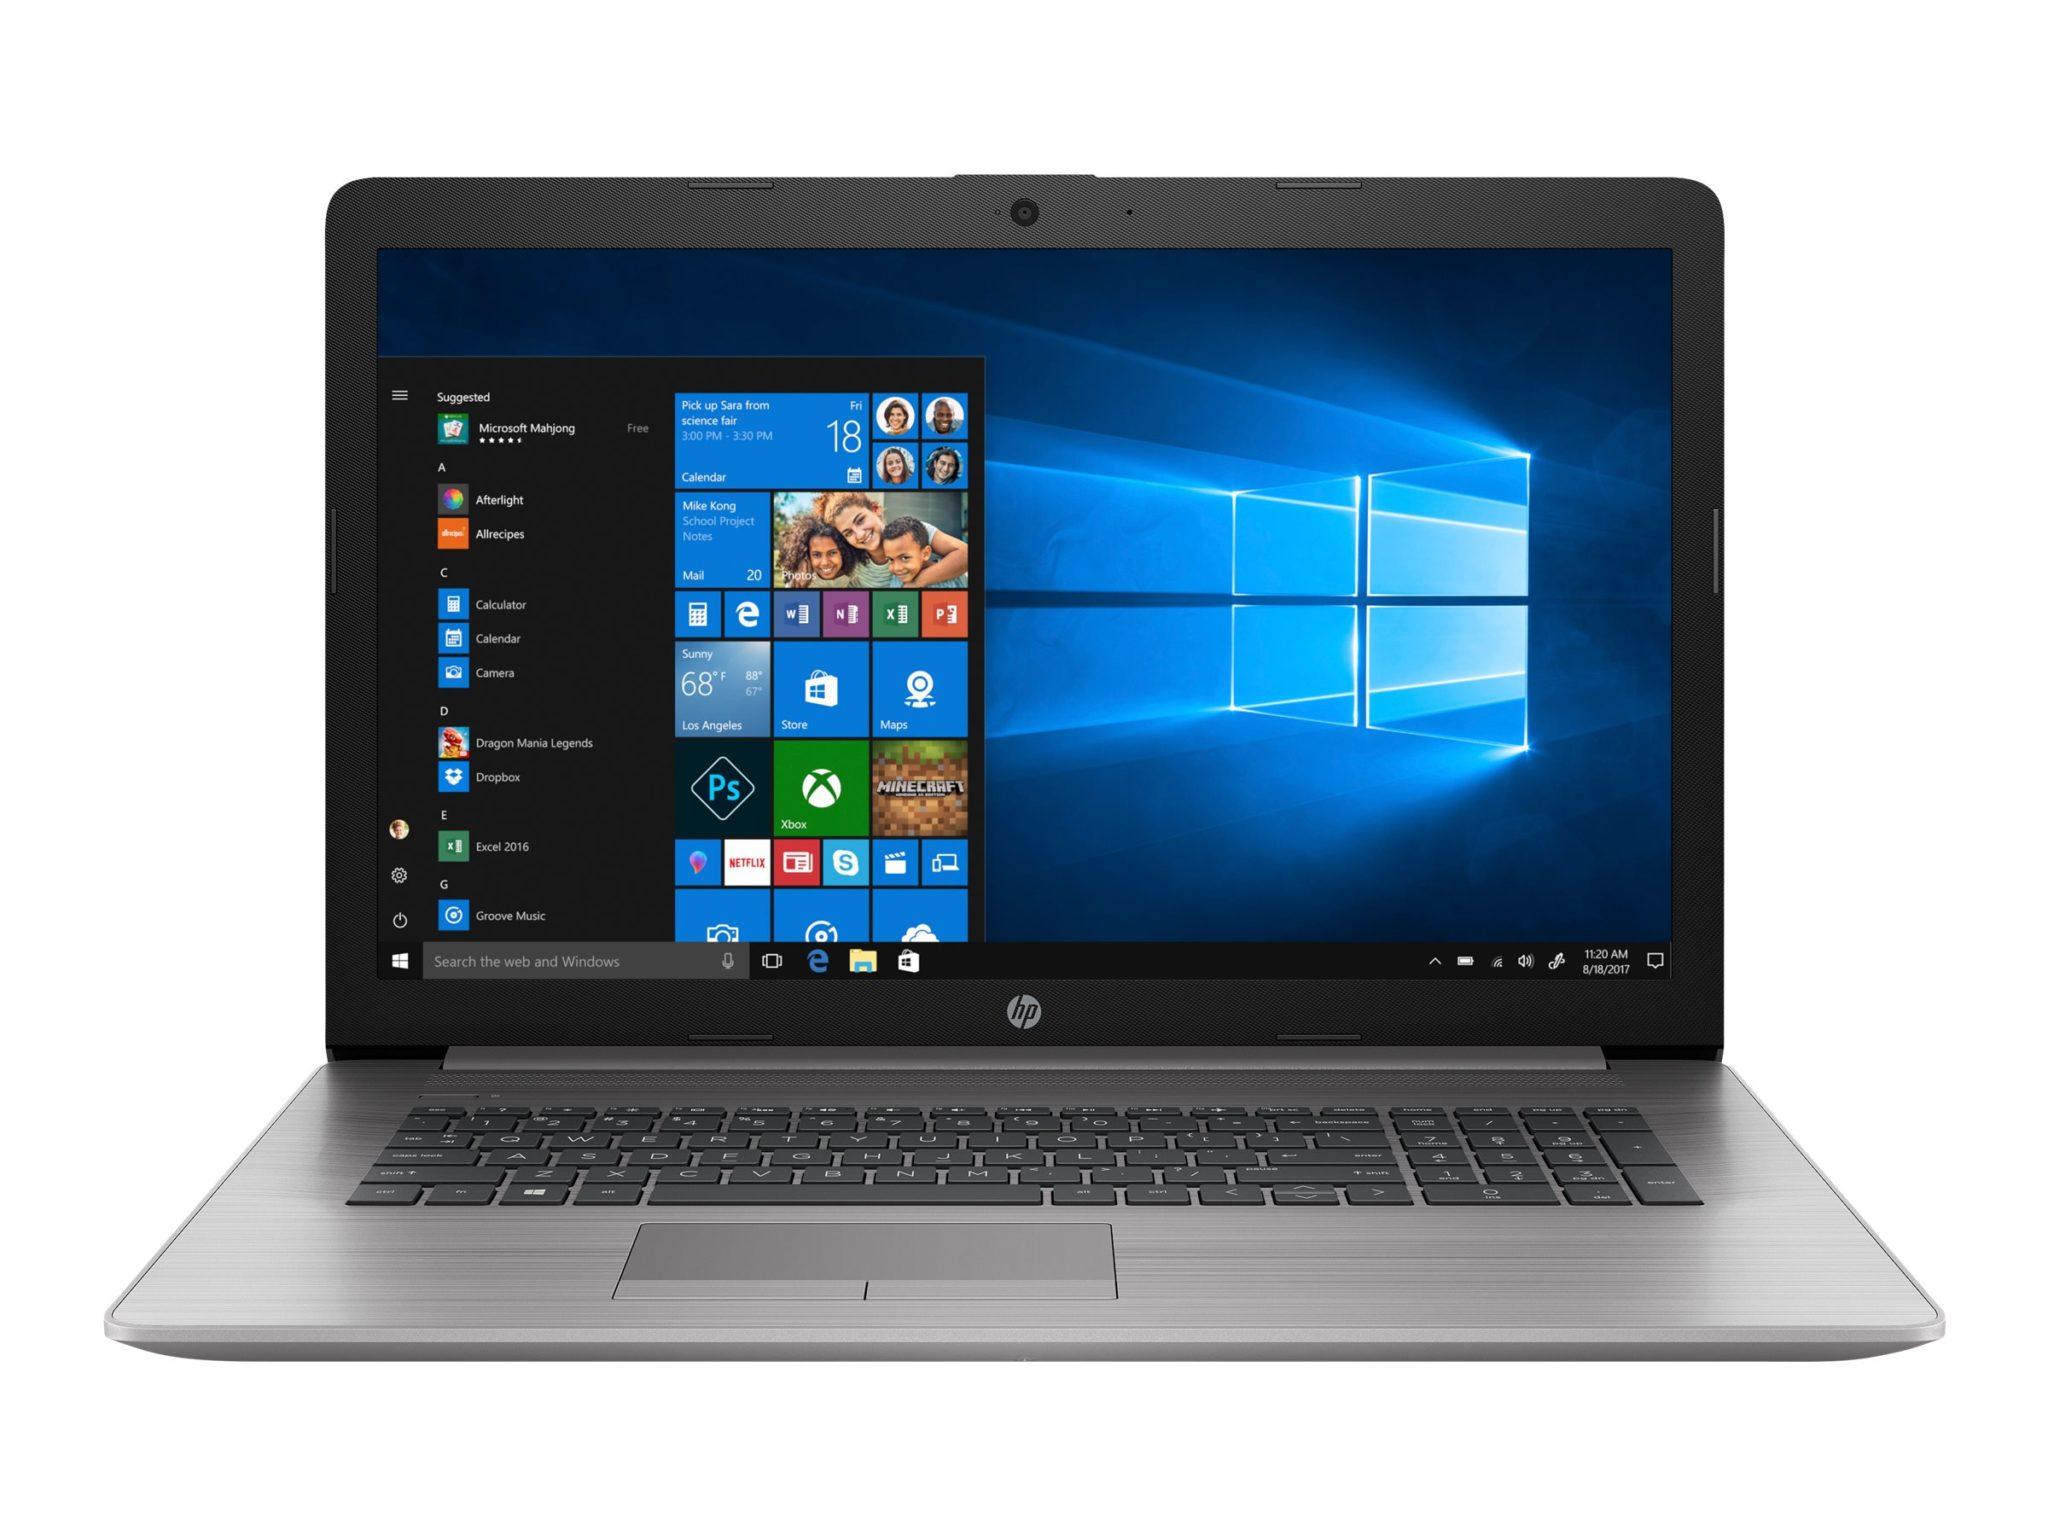 "HP 470 G7 - Smart Buy - 17.3"" - Core i5 10210U - 8 GB RAM - 256 GB SSD - Notebook"